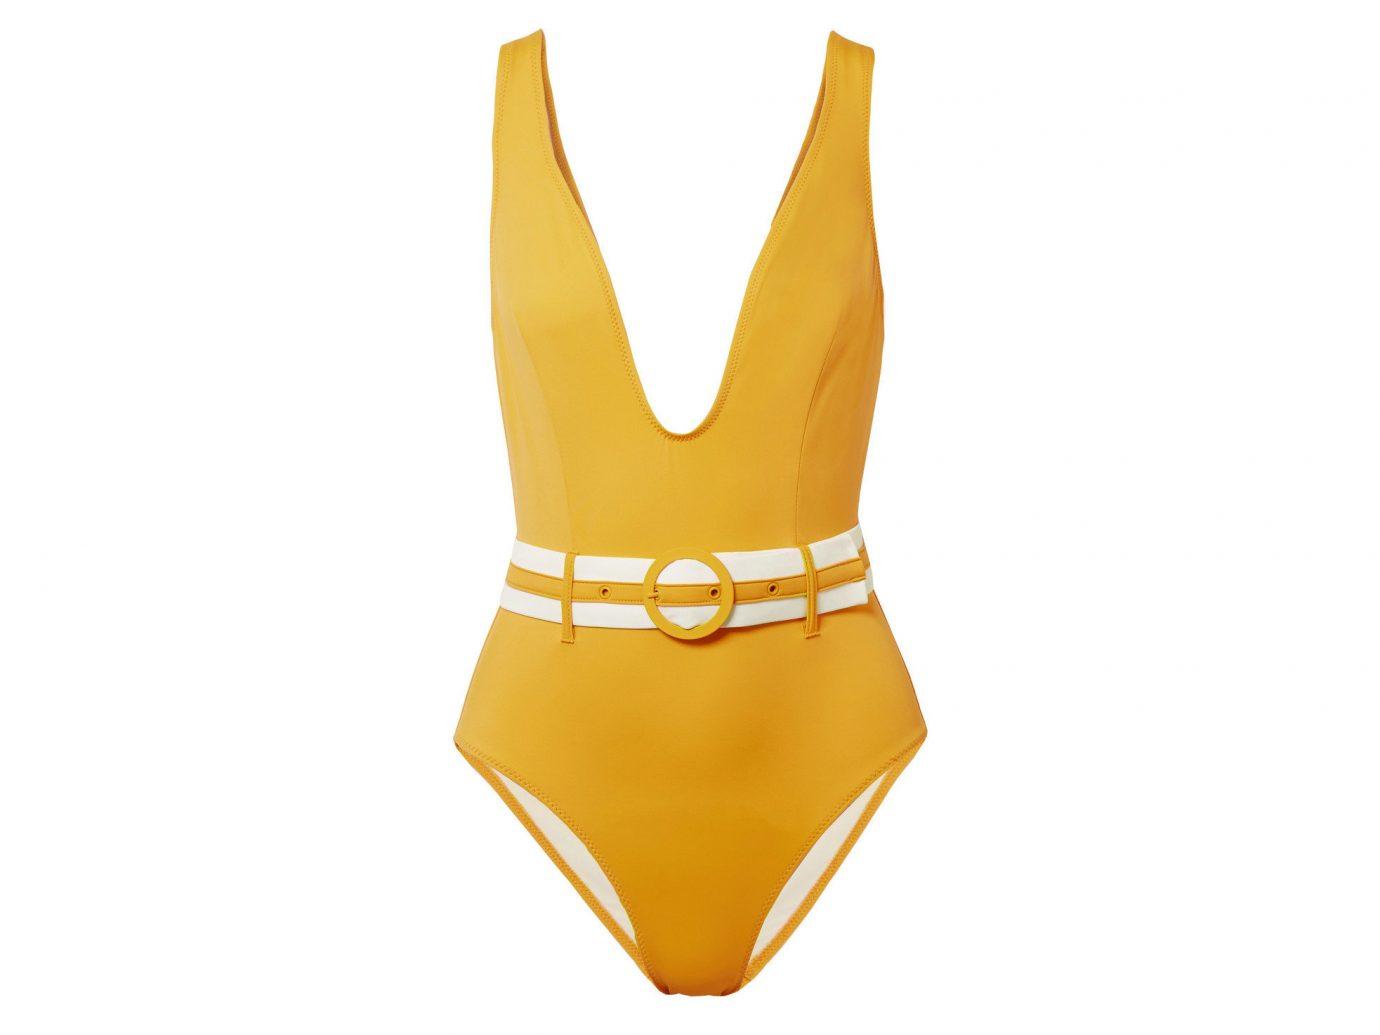 Style + Design Travel Shop yellow swimwear neck swimsuit bottom product design active undergarment one piece swimsuit undergarment maillot underpants